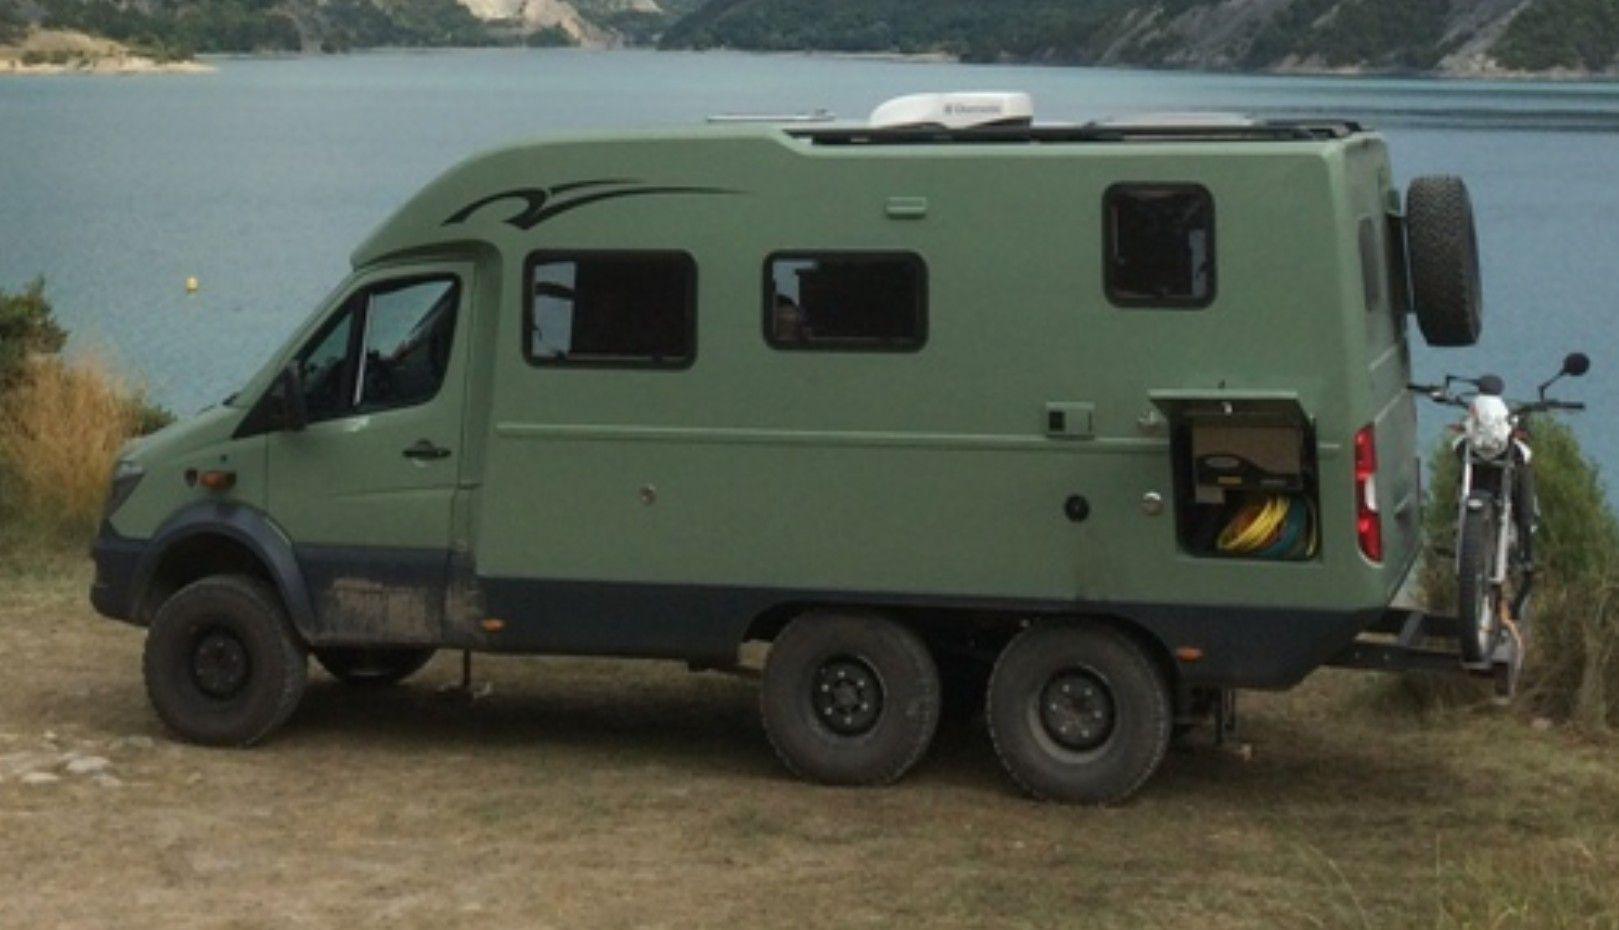 sprinter 6x6 3c cartier camper mercedes van 4x4 van et truck camper. Black Bedroom Furniture Sets. Home Design Ideas